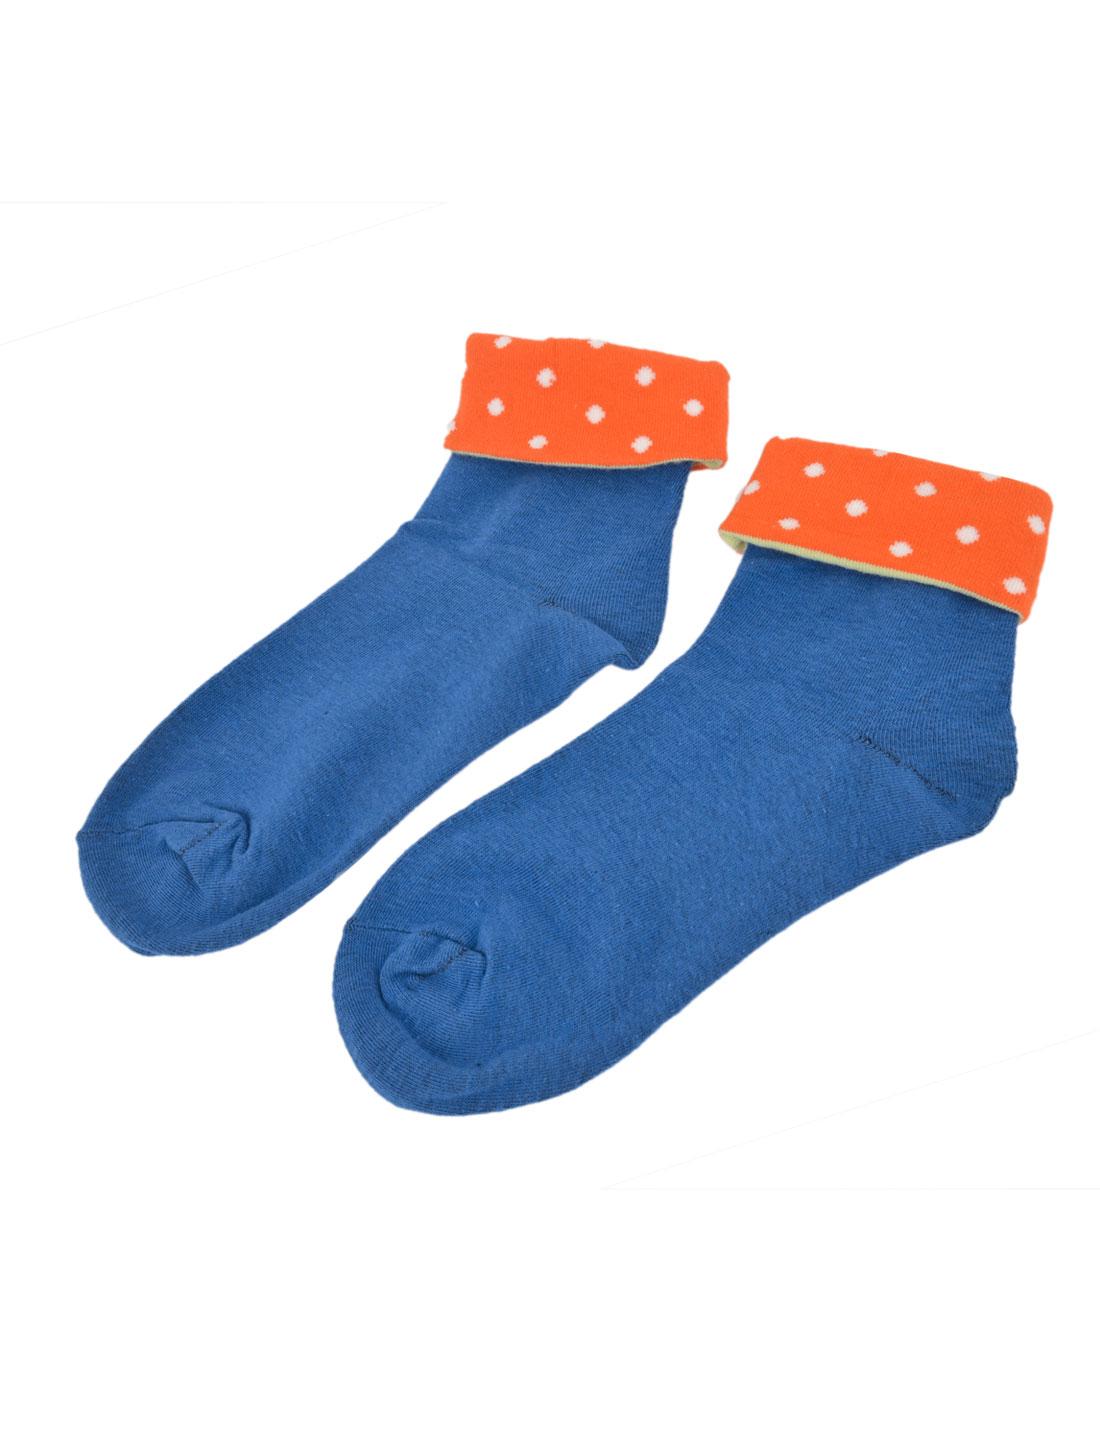 Woman Roll Cuff Ankle Length Soft Warmming Crew Hosiery Socks Orange Blue Pair